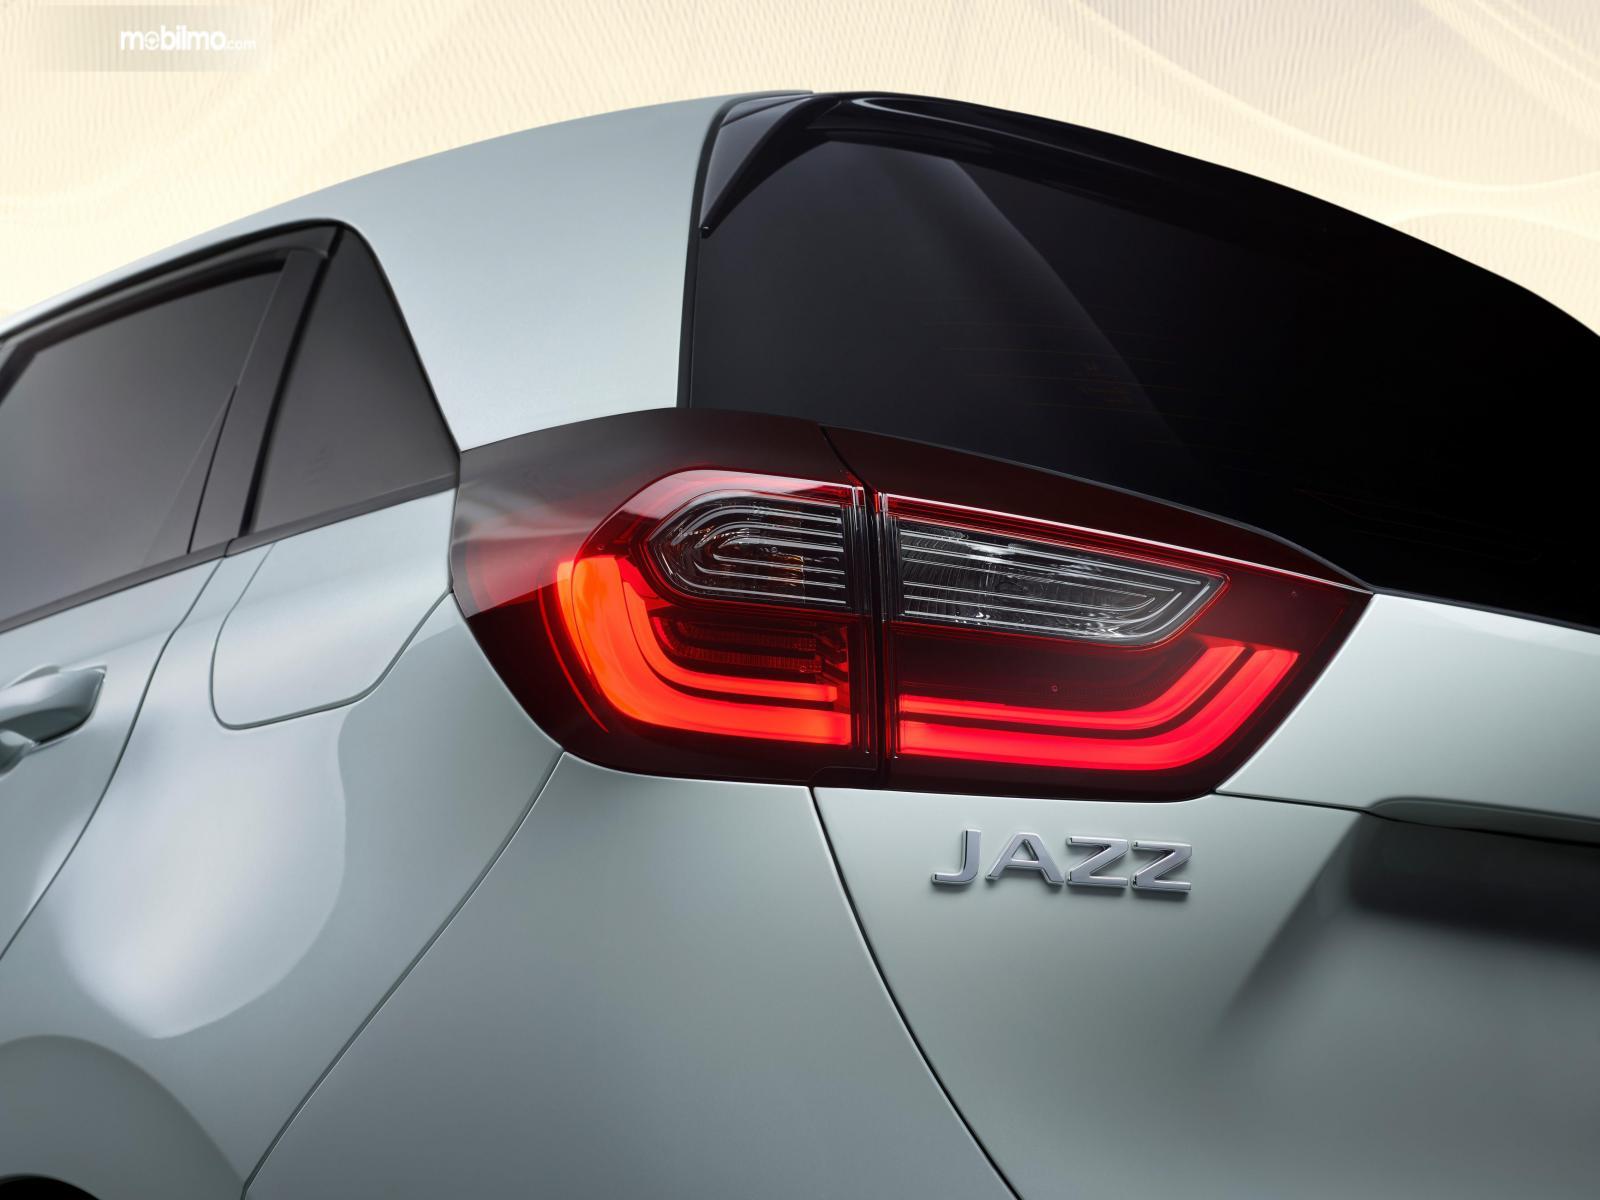 Gambar menunjukkan lampu belakang mobil Honda Jazz 2020